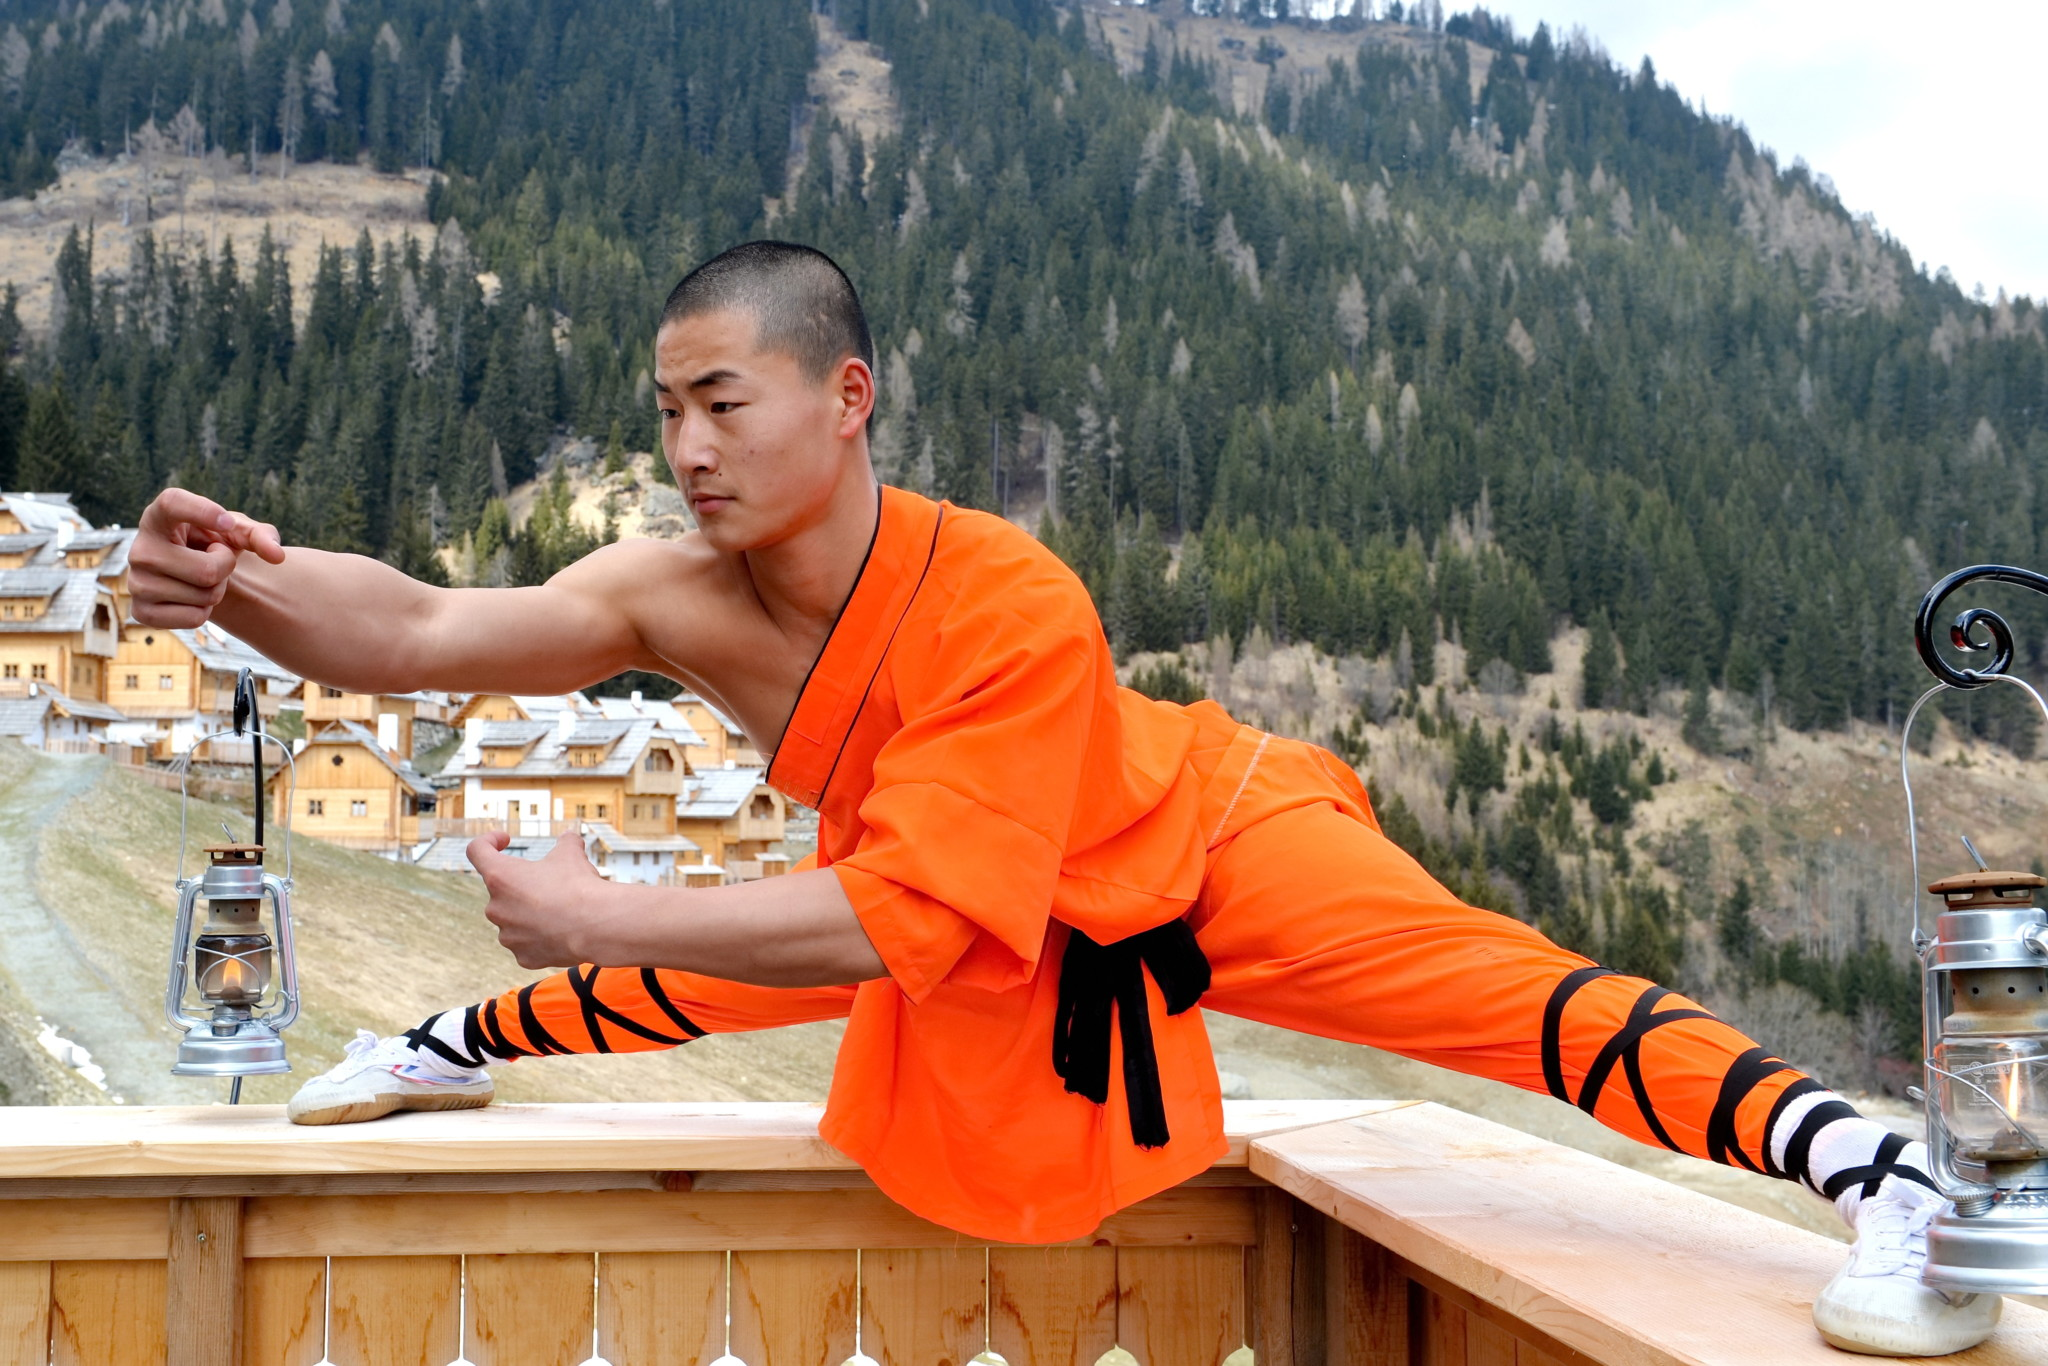 Shaolin Moenche_0195_2